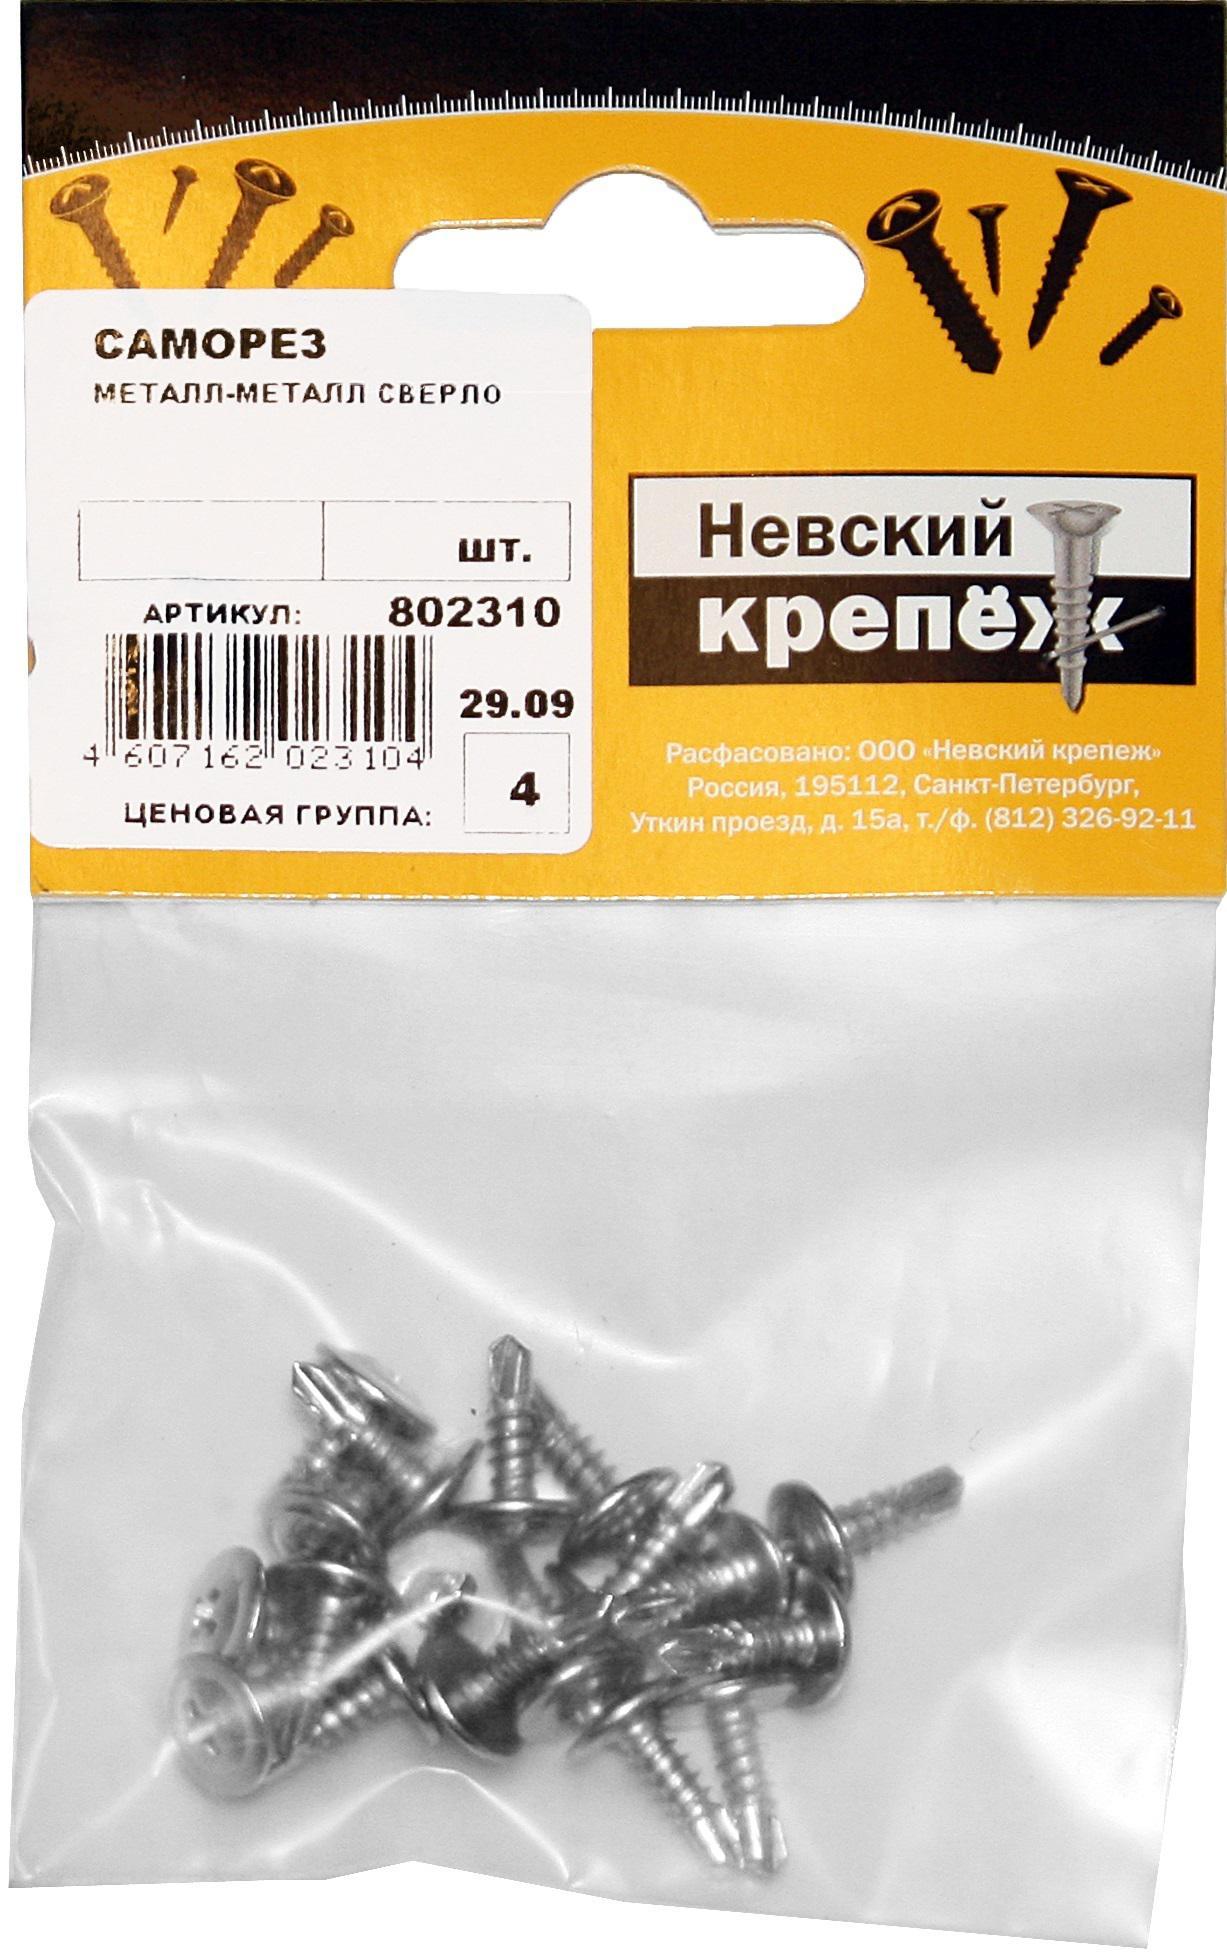 Саморез НЕВСКИЙ КРЕПЕЖ 802311